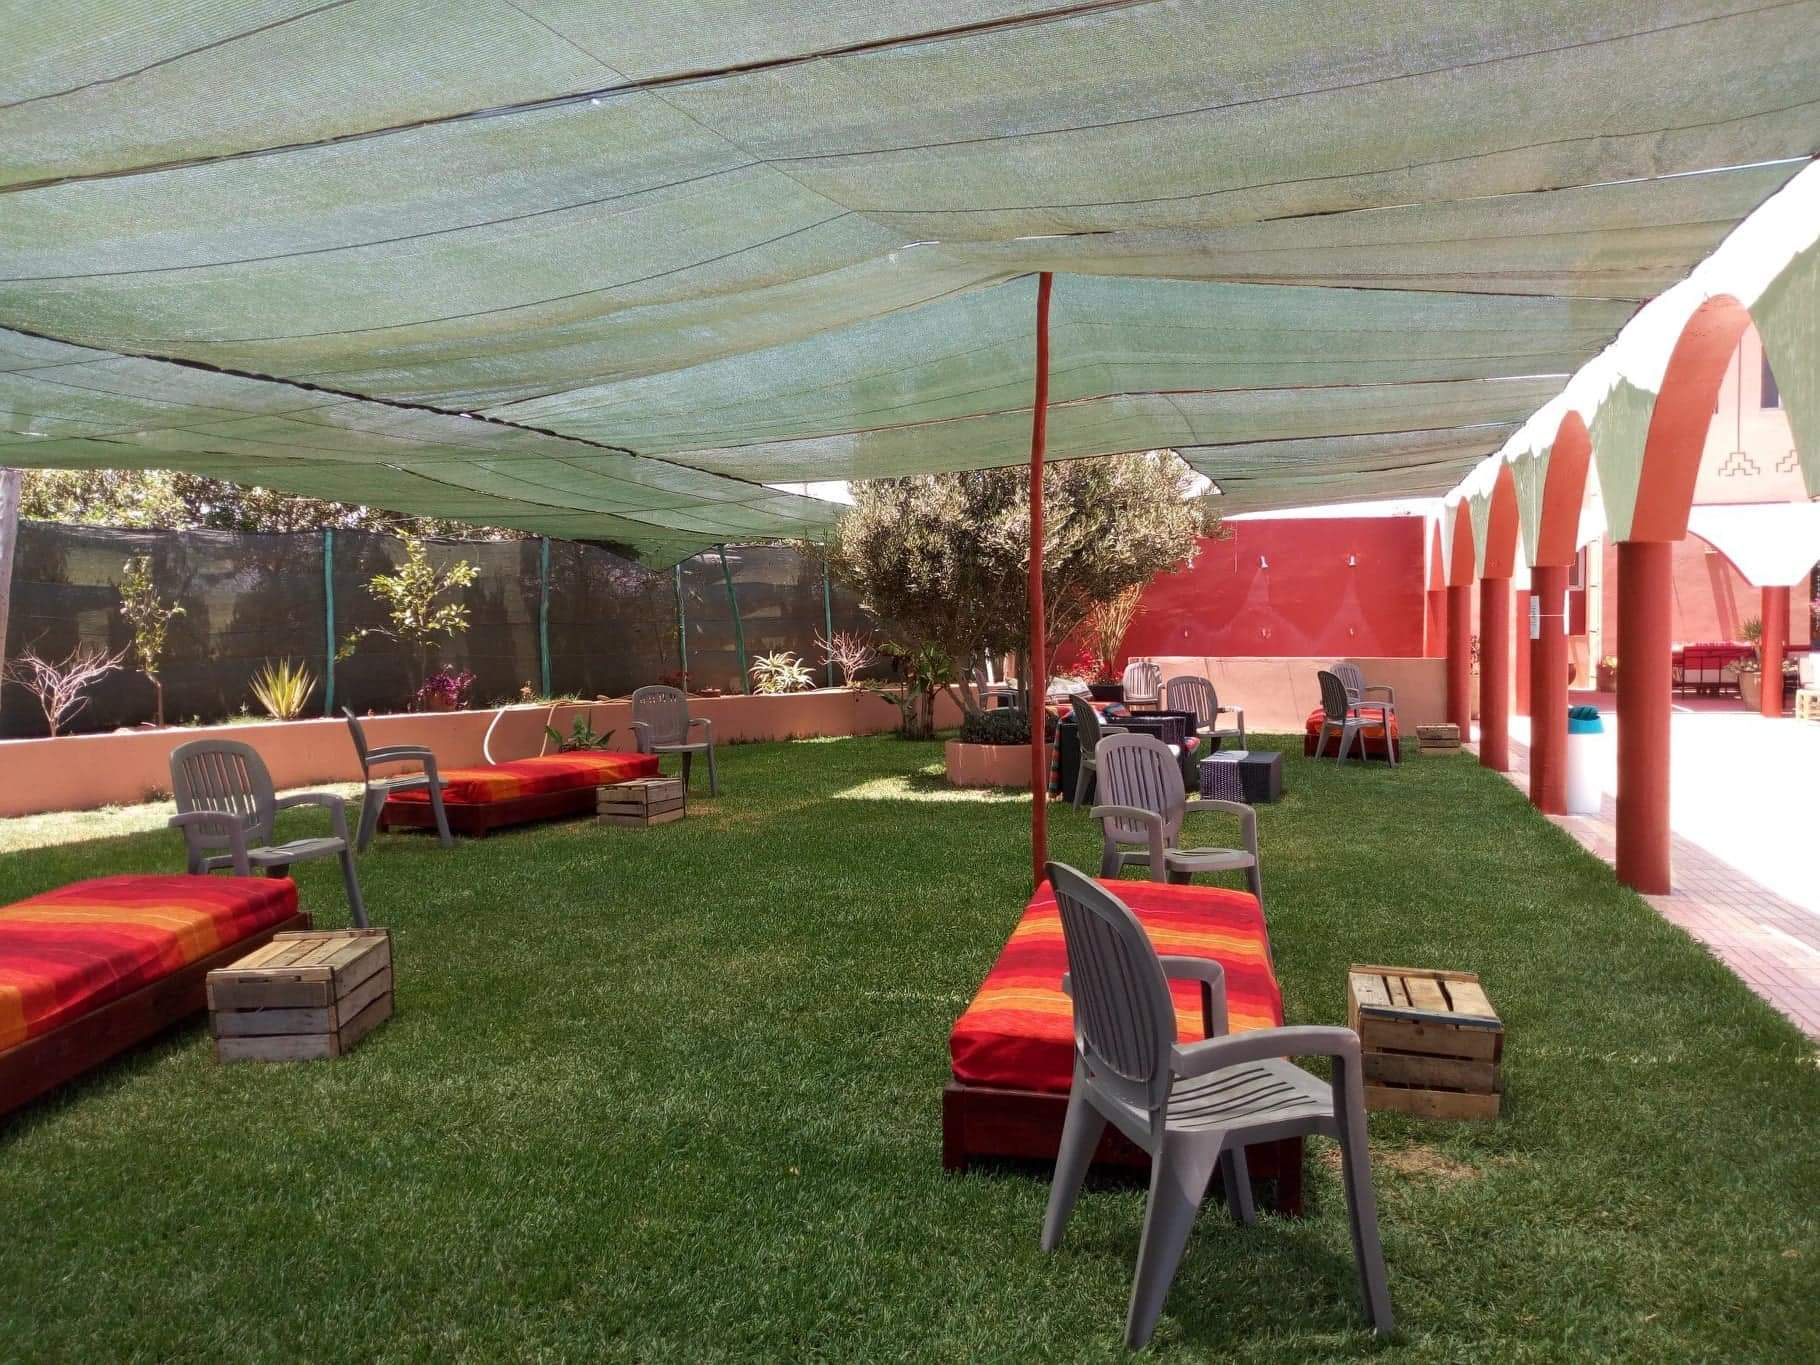 Camping avec piscine et restaurant à vendre au Maroc (Agadir)